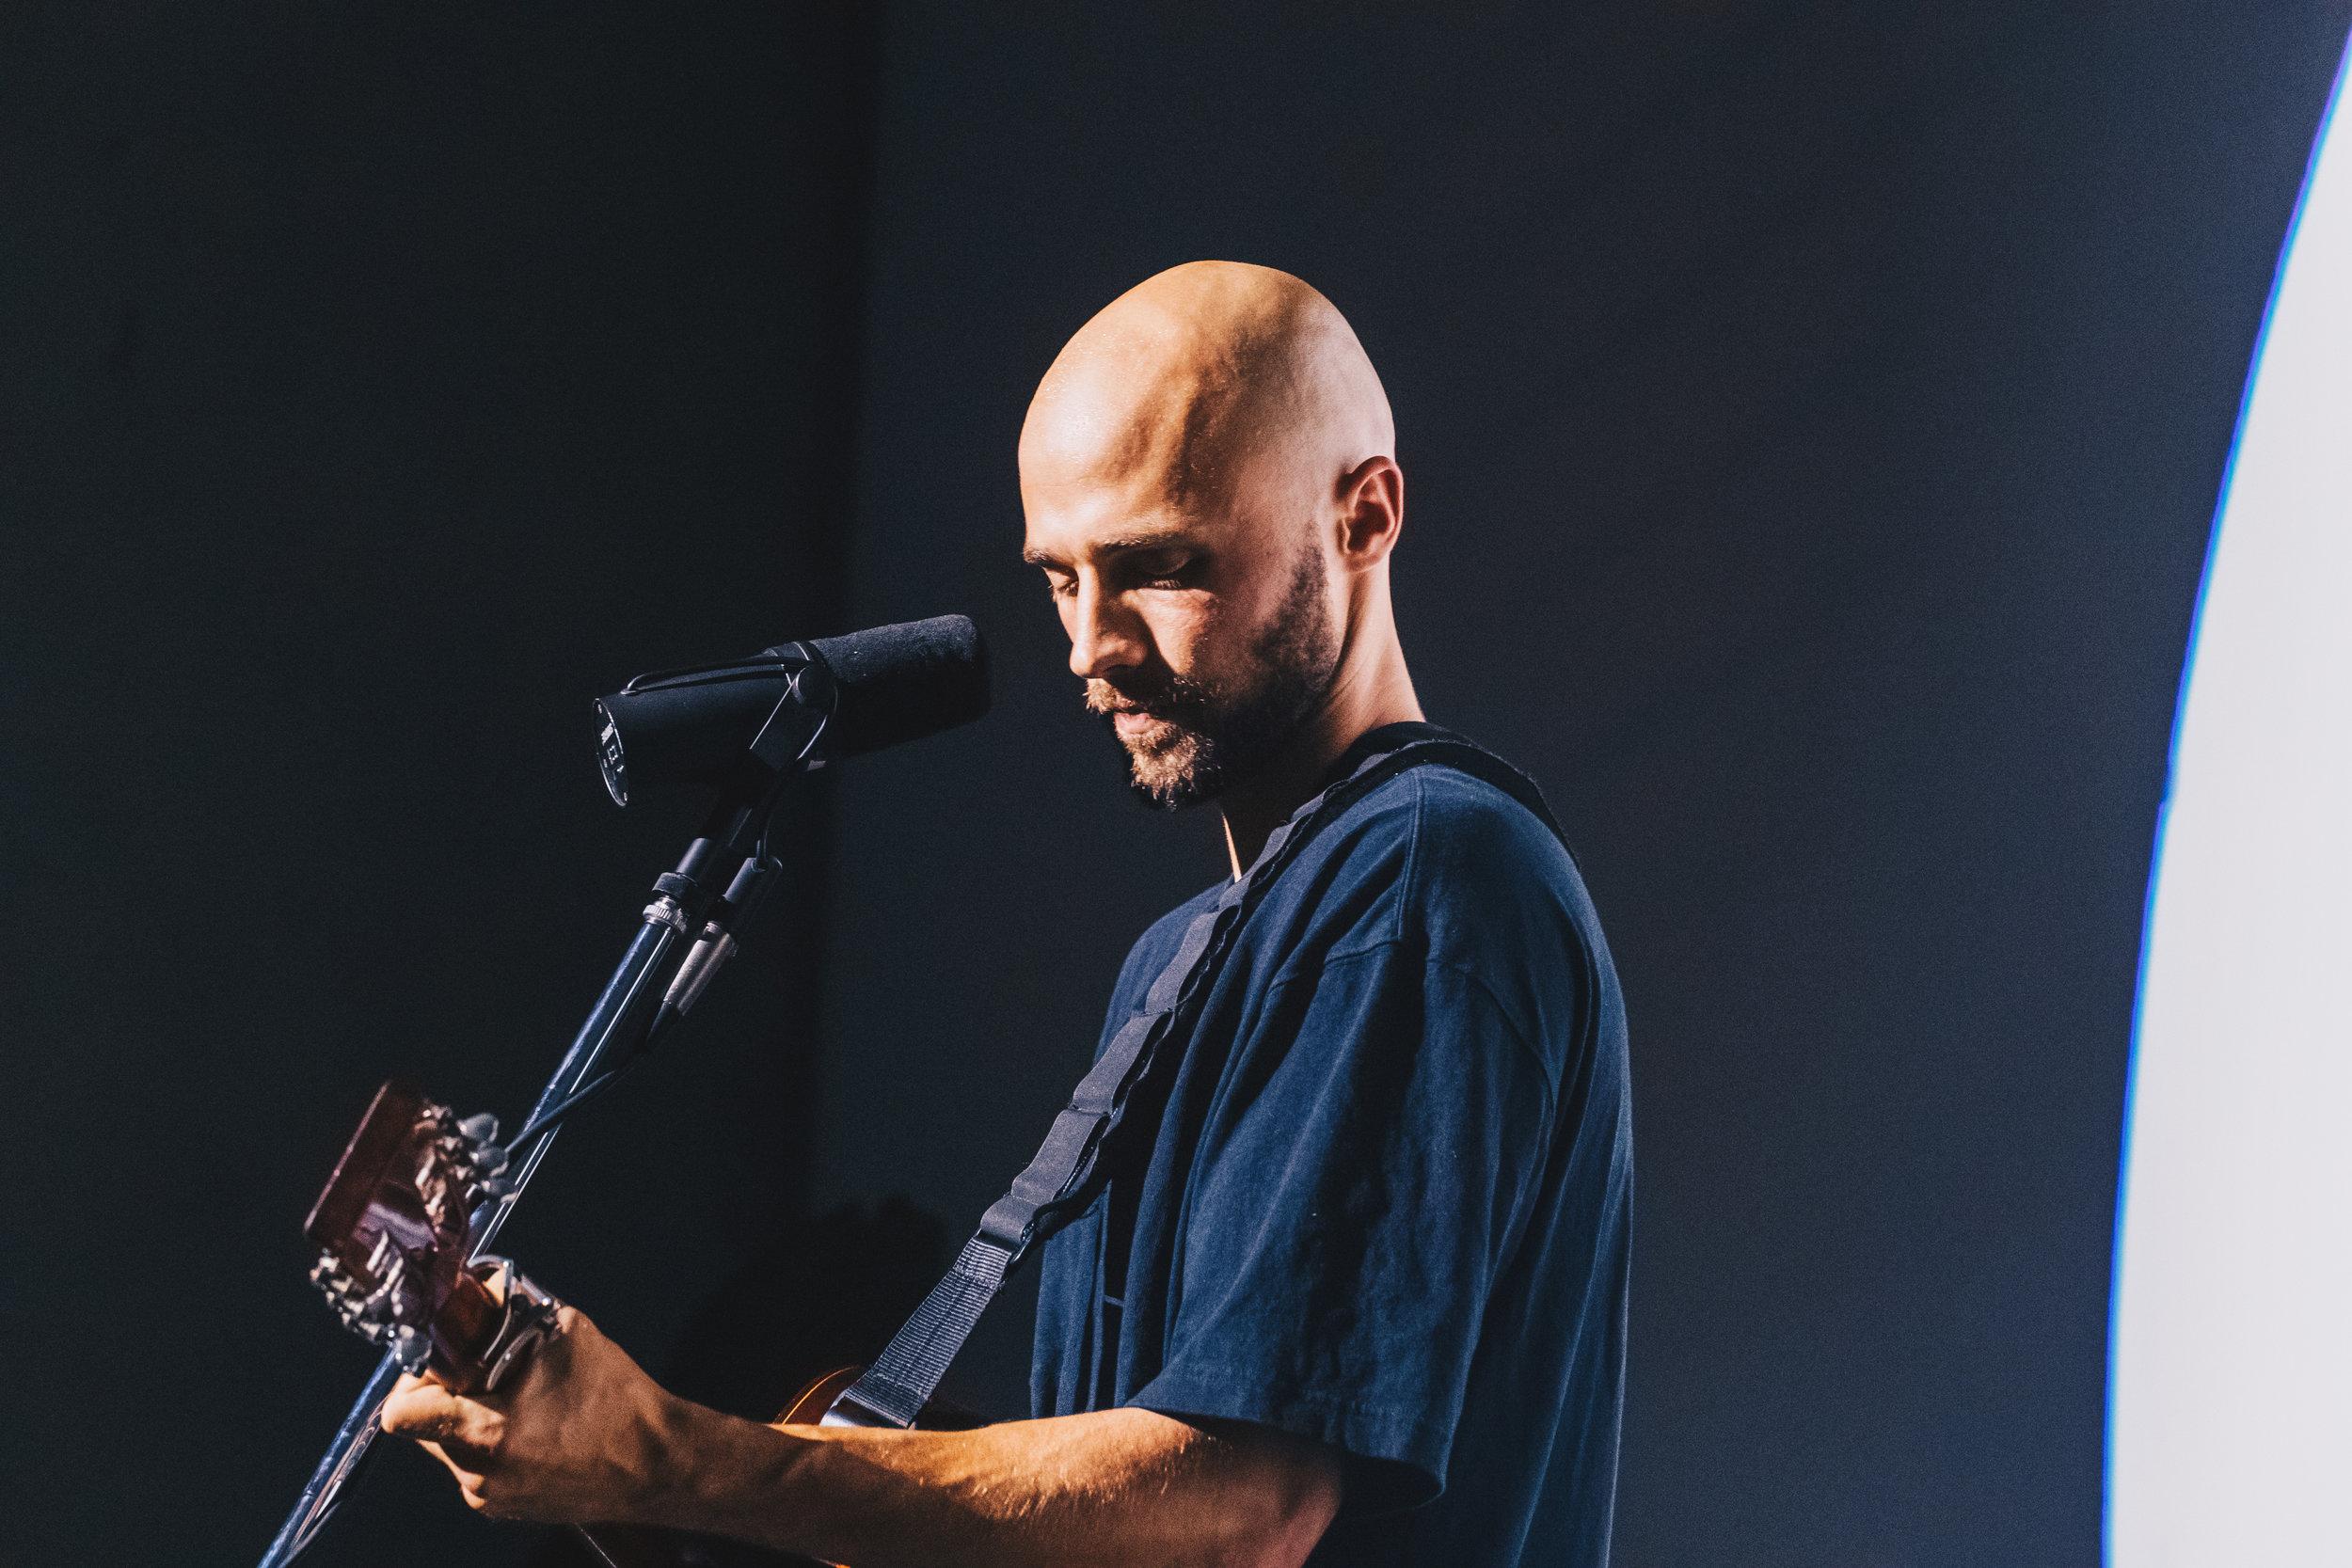 crotti-show-2018-the-borough-acoustic-singer-sydney.jpg